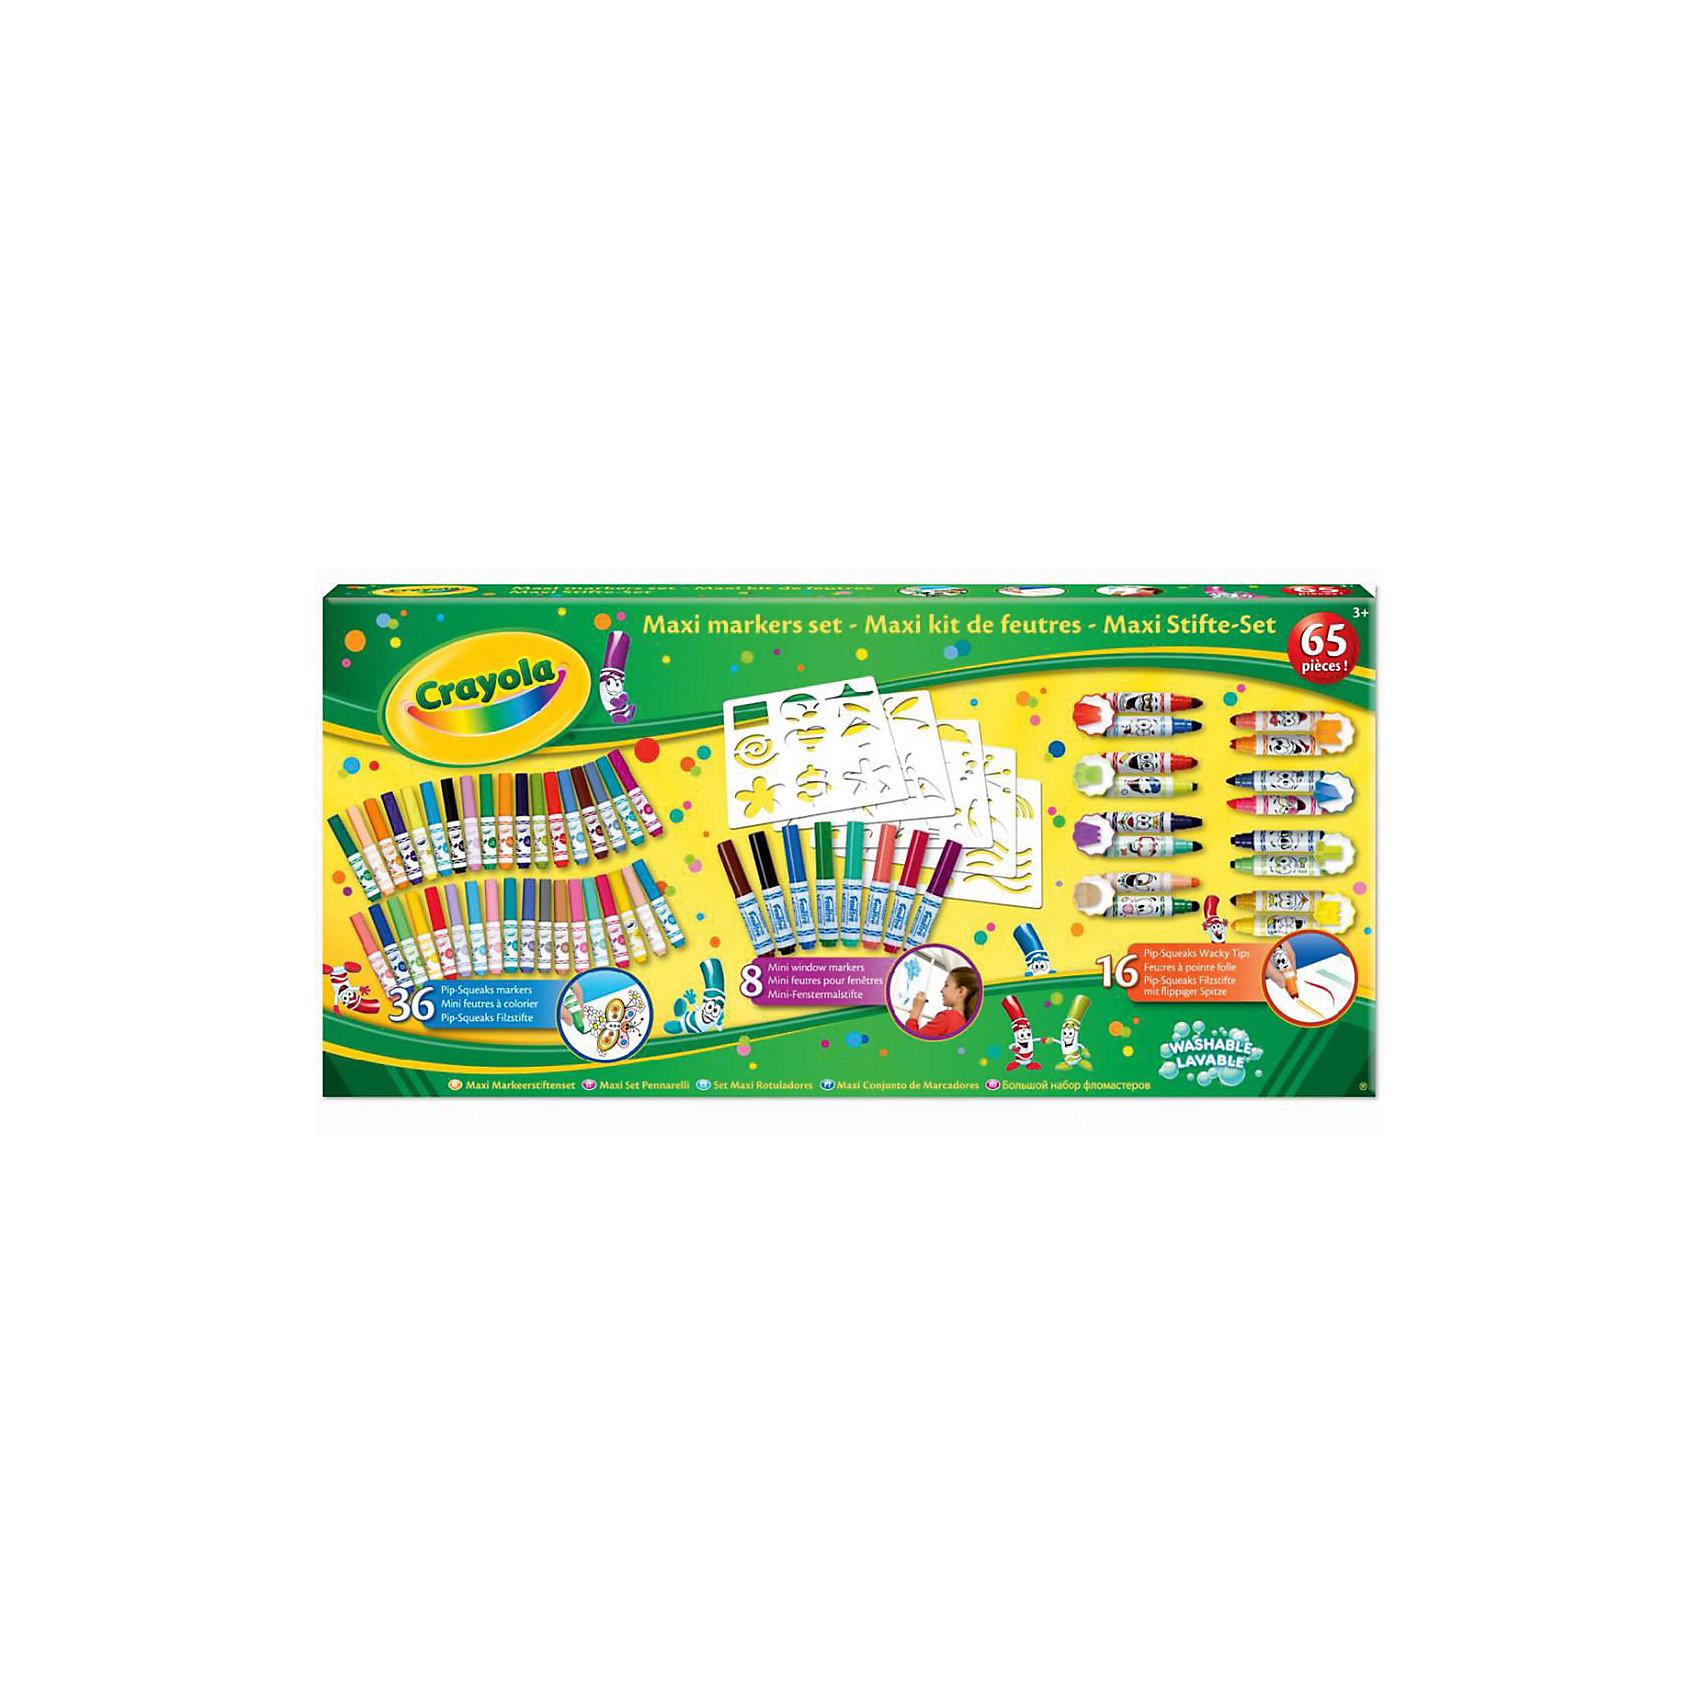 Crayola Гигантский набор фломастеров, Crayola crayola llc crayola oil pastels 28 color set set of 12